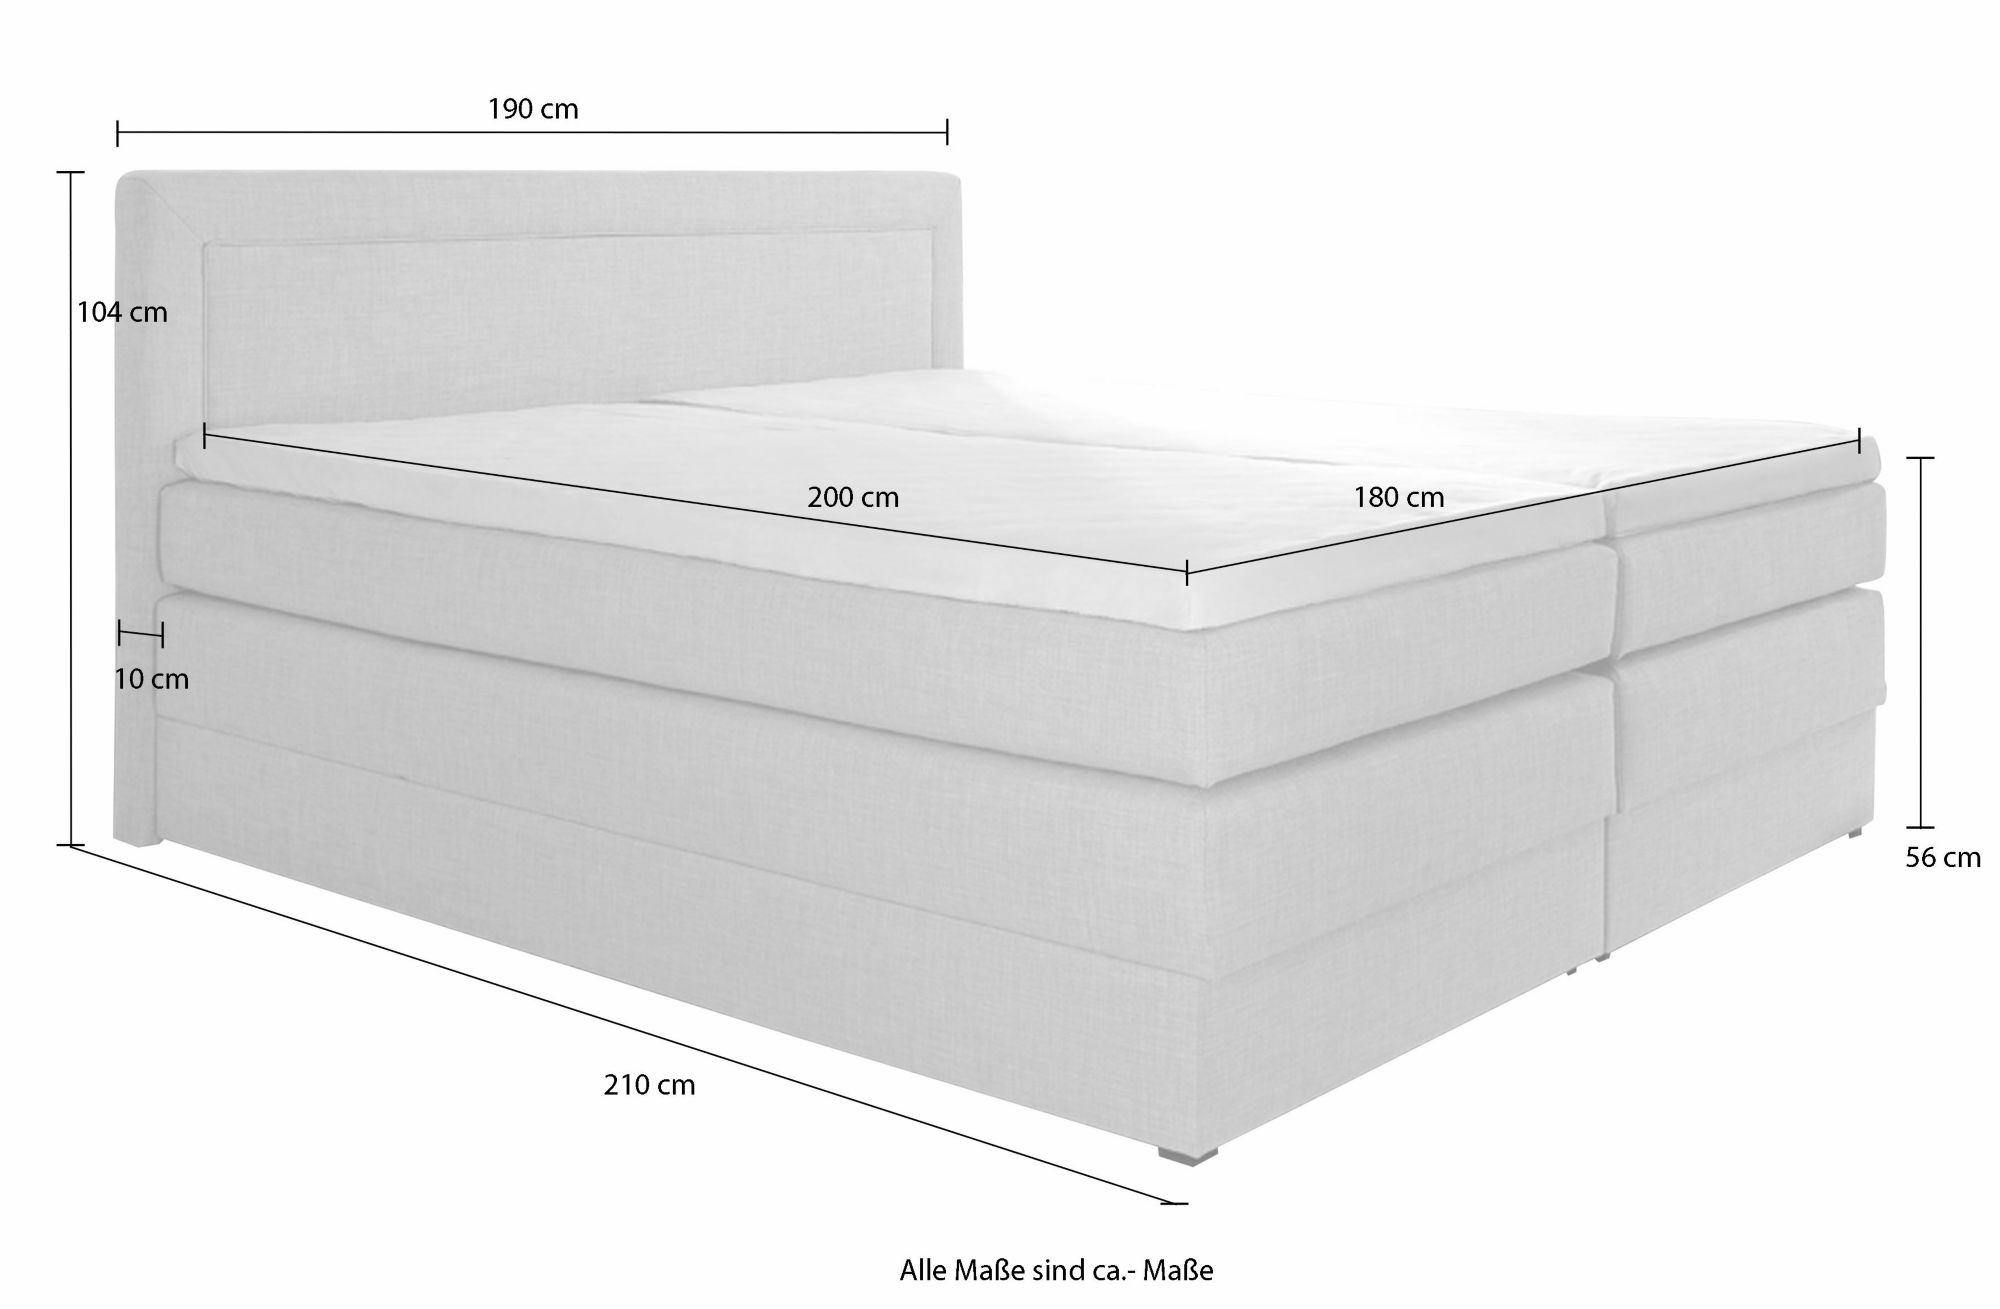 hapo boxspringbett mit bettkasten schwab versand betten. Black Bedroom Furniture Sets. Home Design Ideas